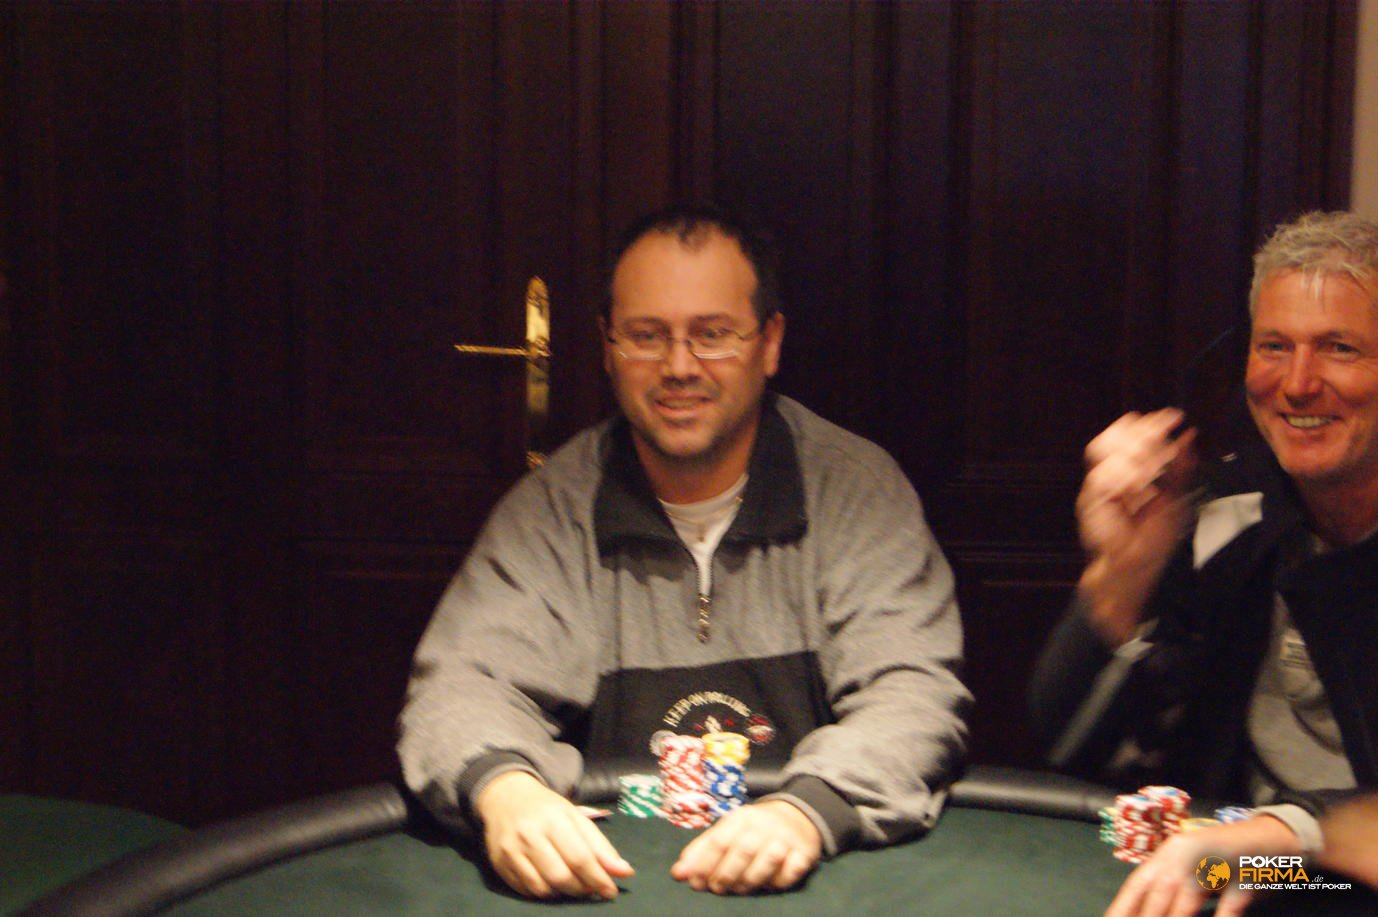 Poker_EM_2000_NLH_251011_Uli_Richard